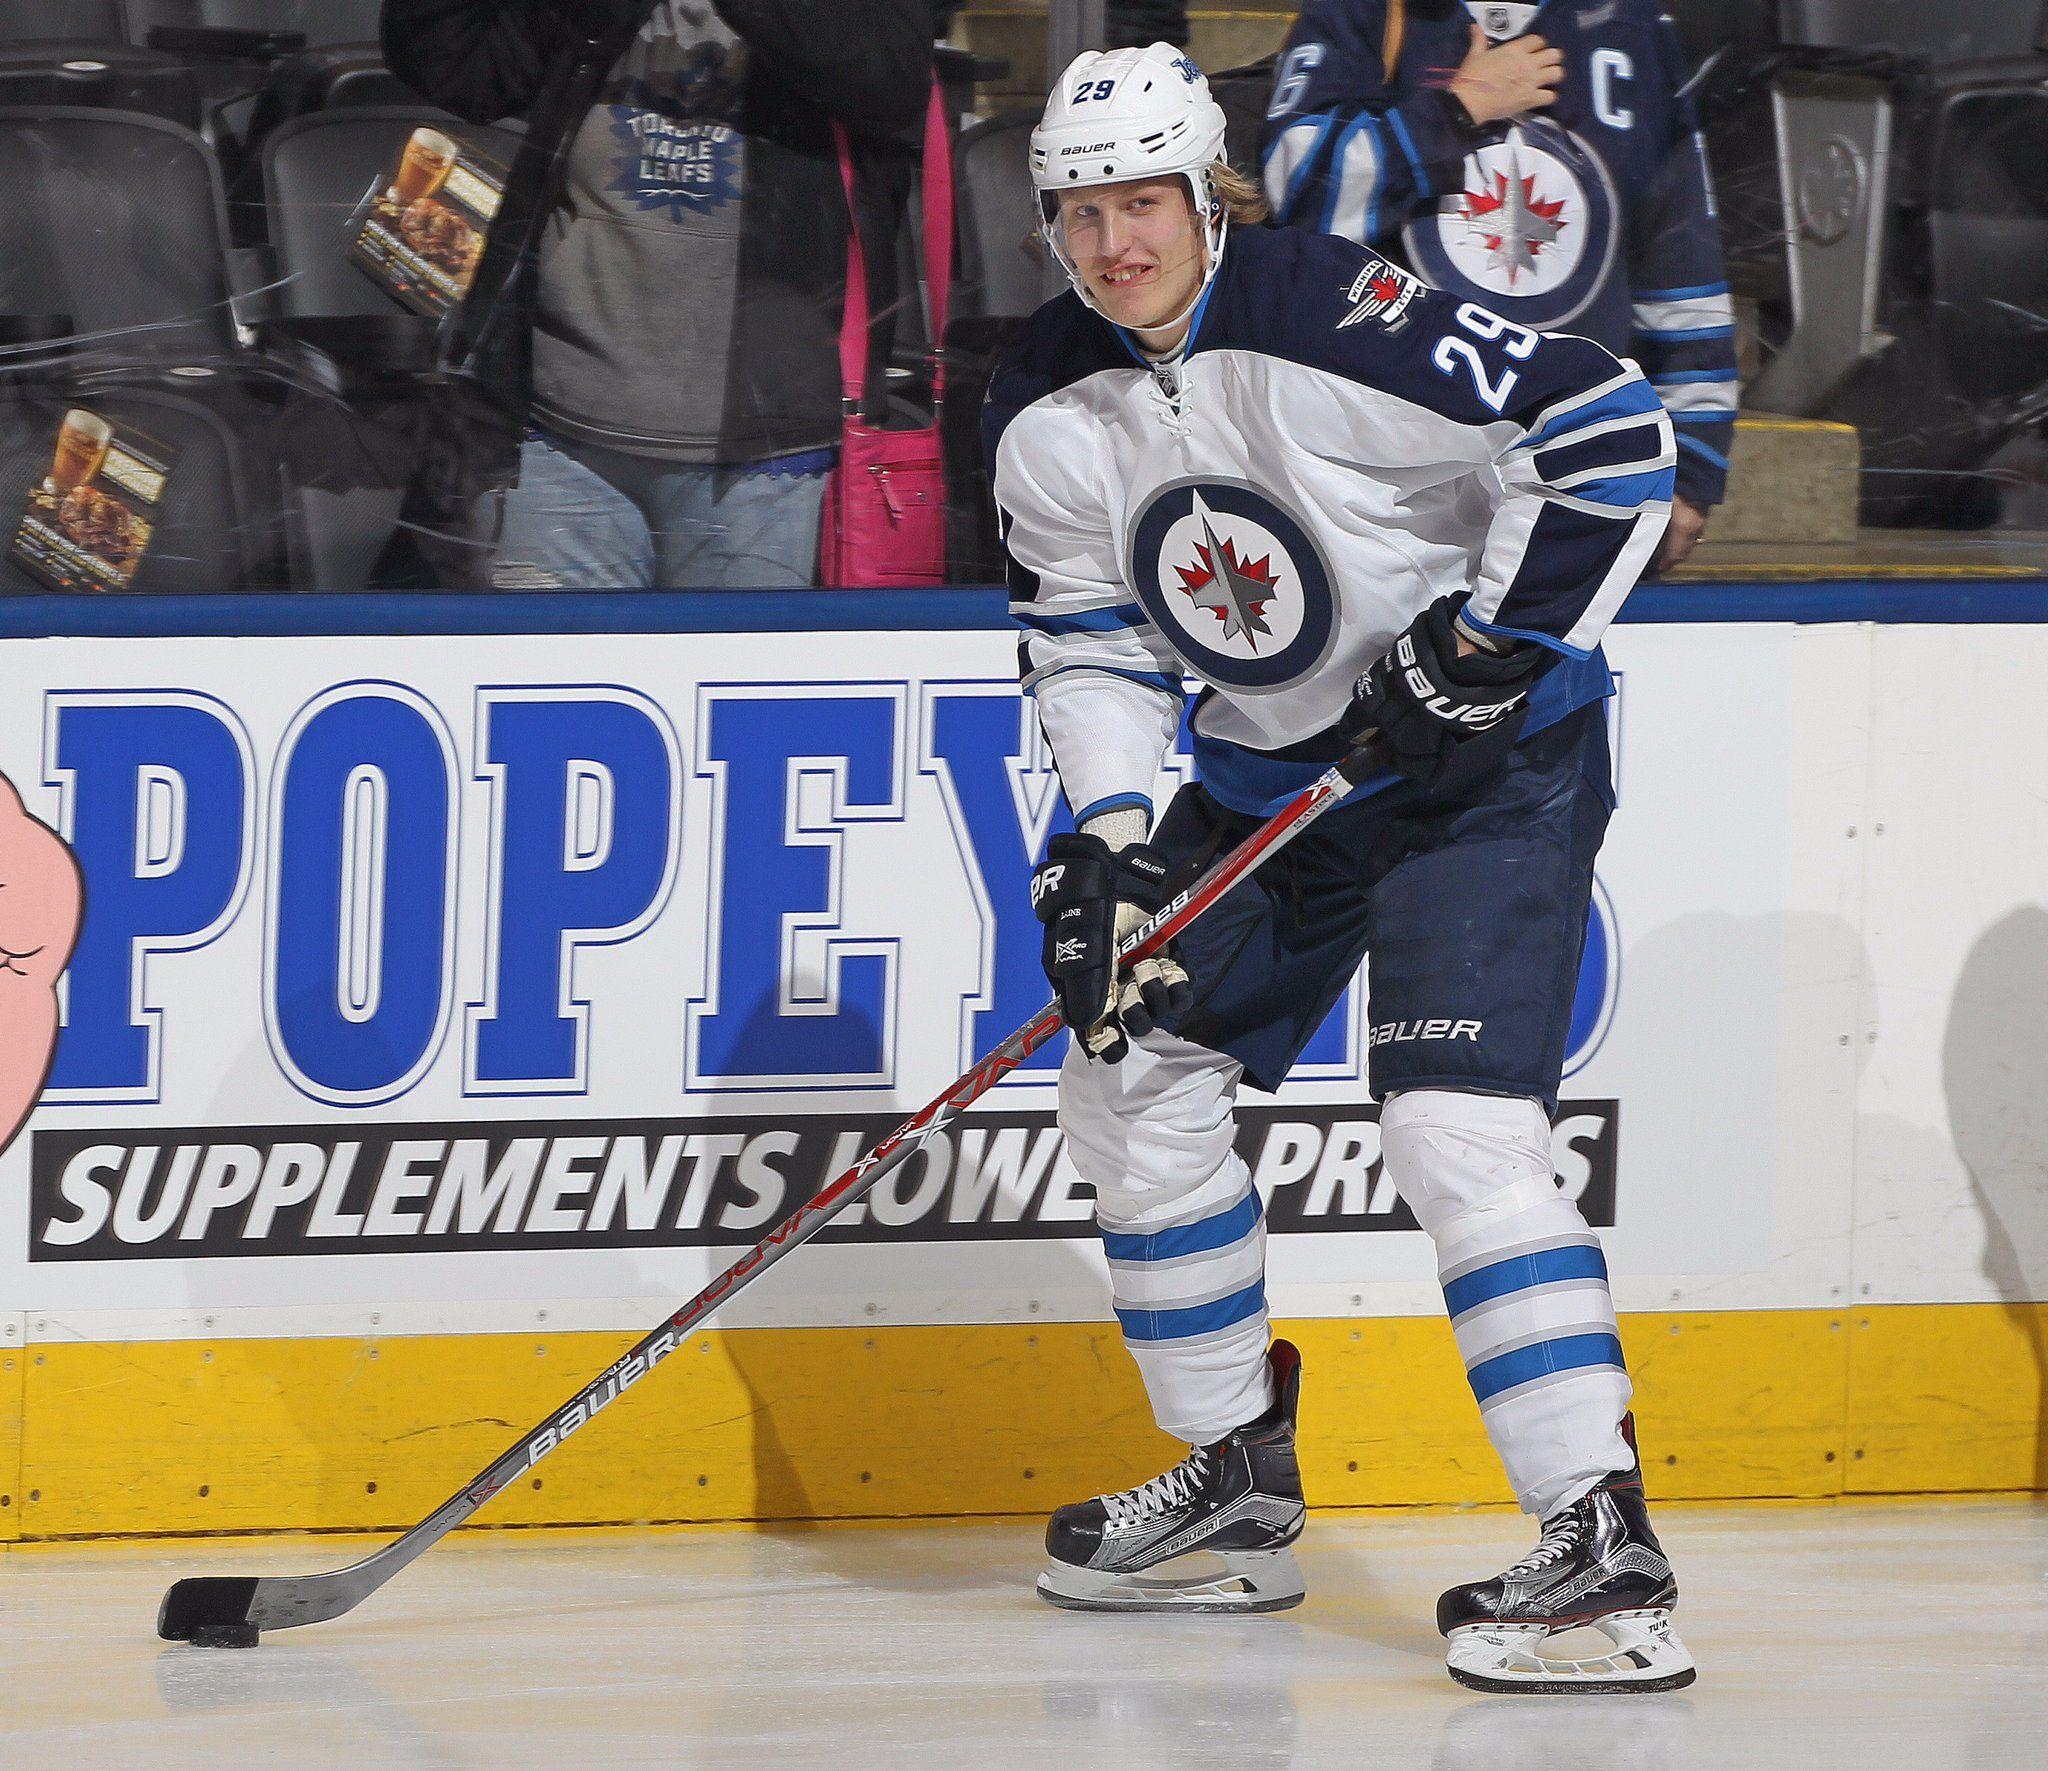 Patrik Laine scored his 29th goal of 2016-17 to regain NHL rookie ...